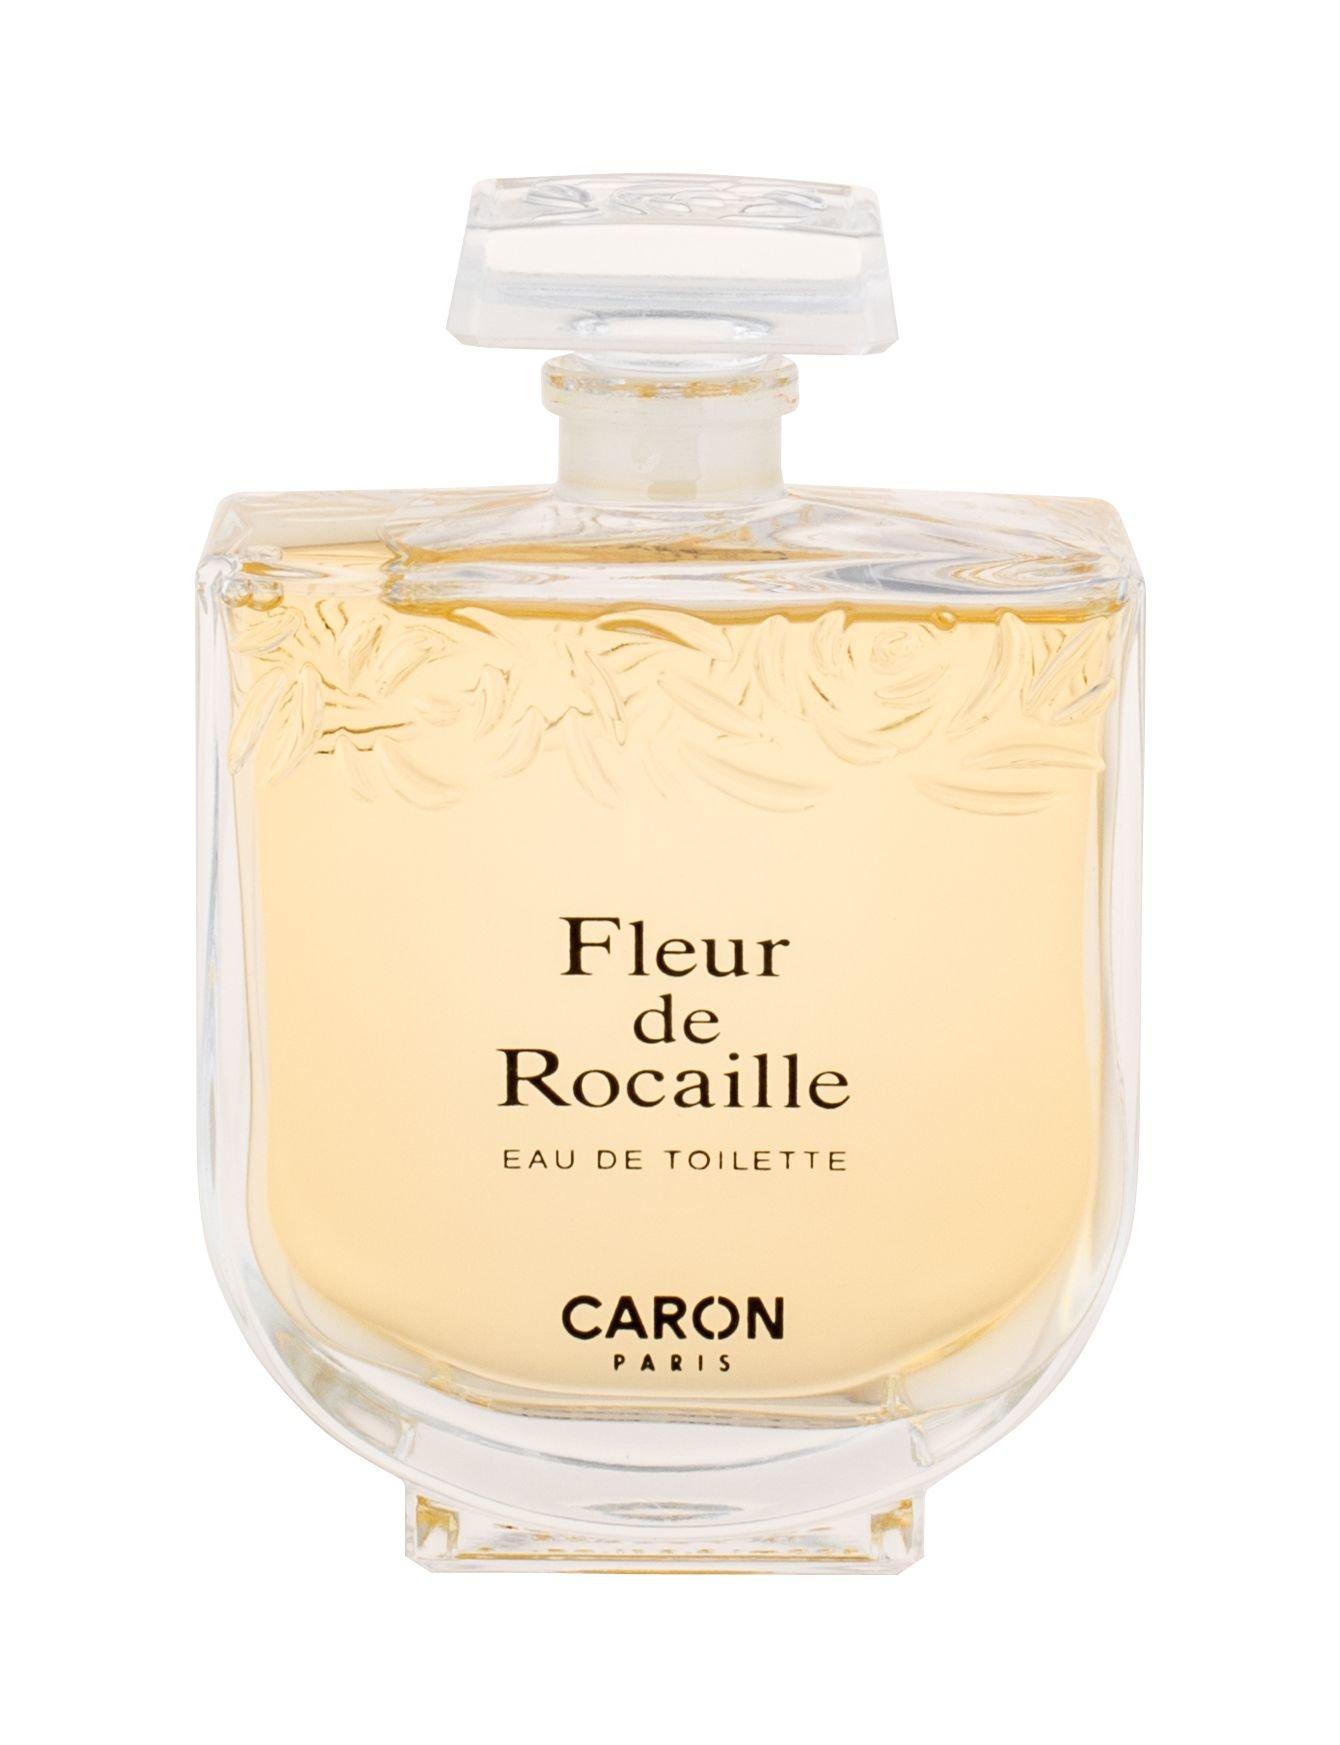 Caron Fleur de Rocaille EDT 100ml